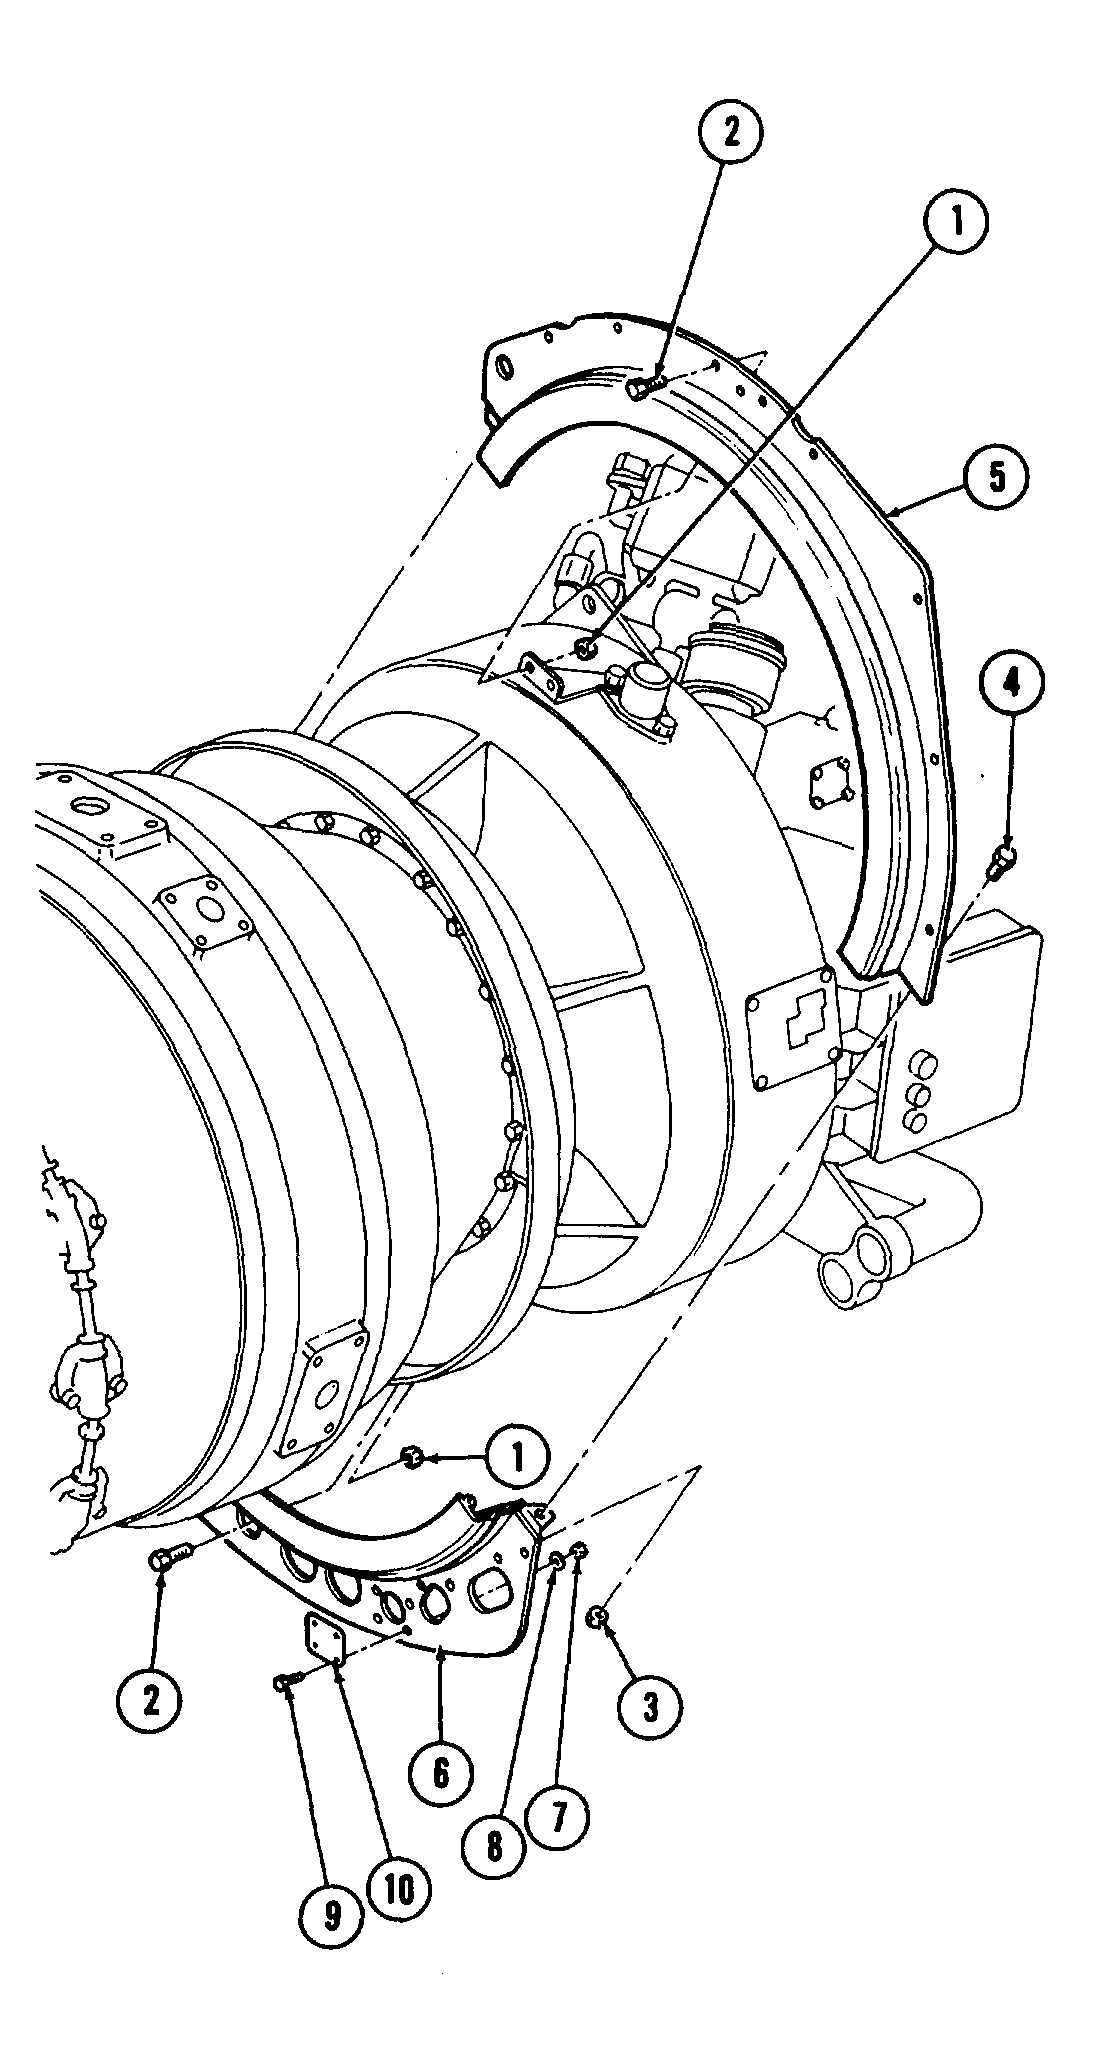 Mi tm pressure washer manual